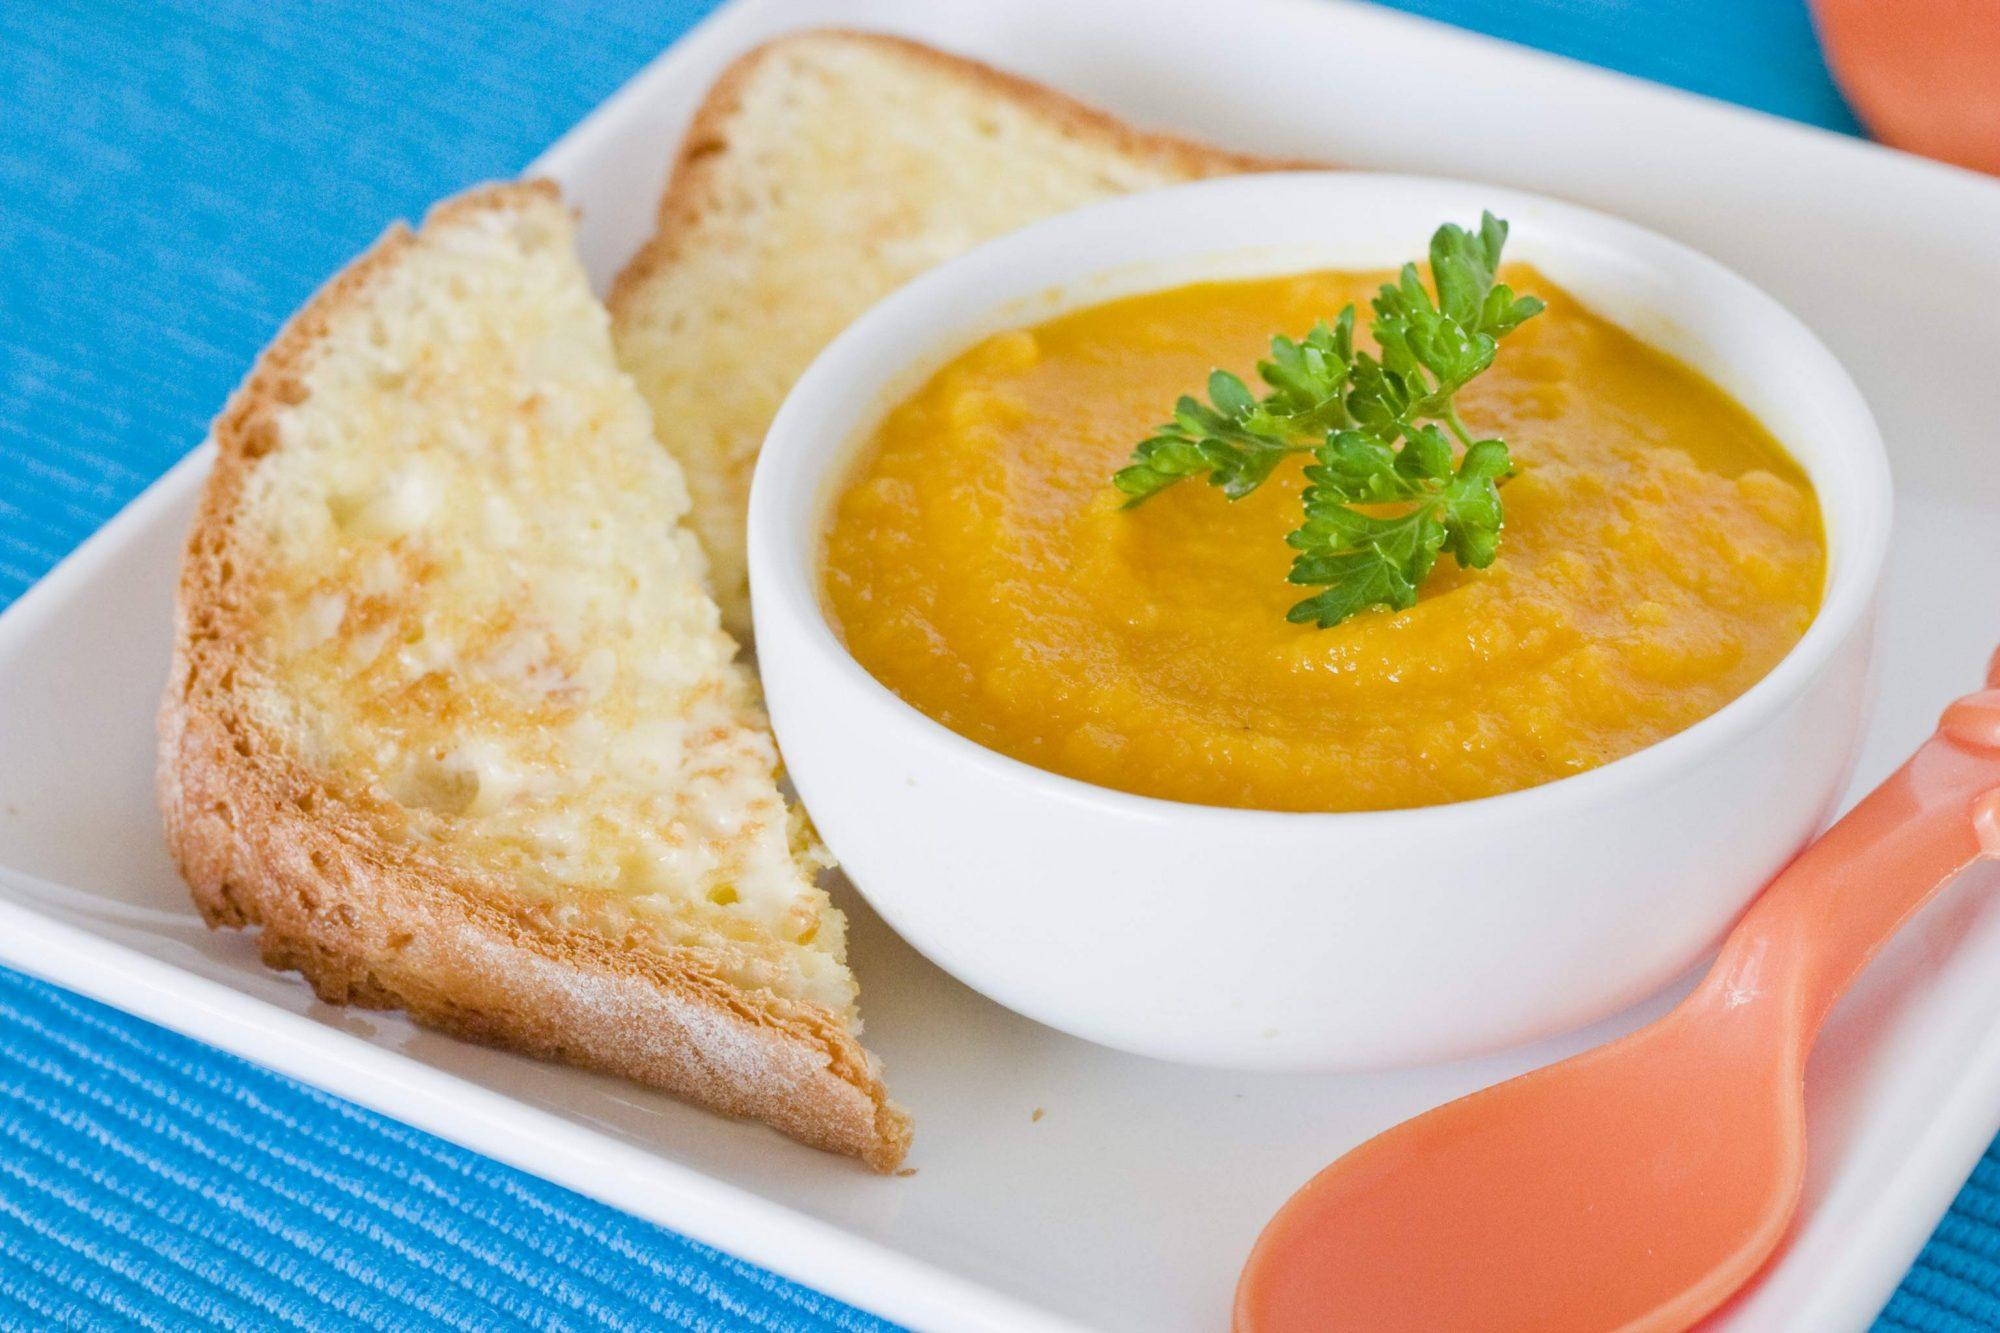 Carrot-Parsnip Soup